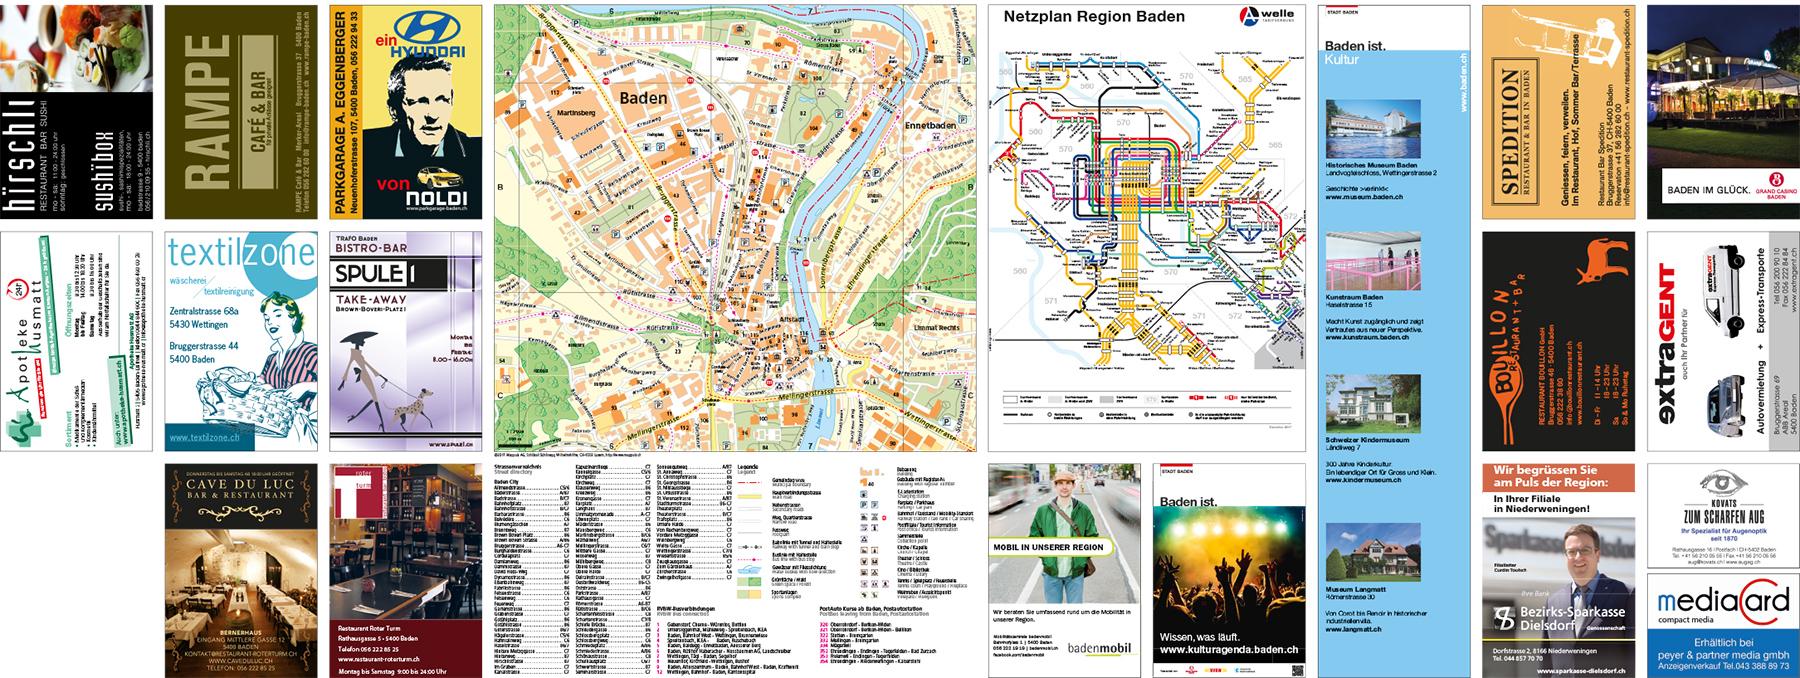 Stadtplan Baden Rückseite